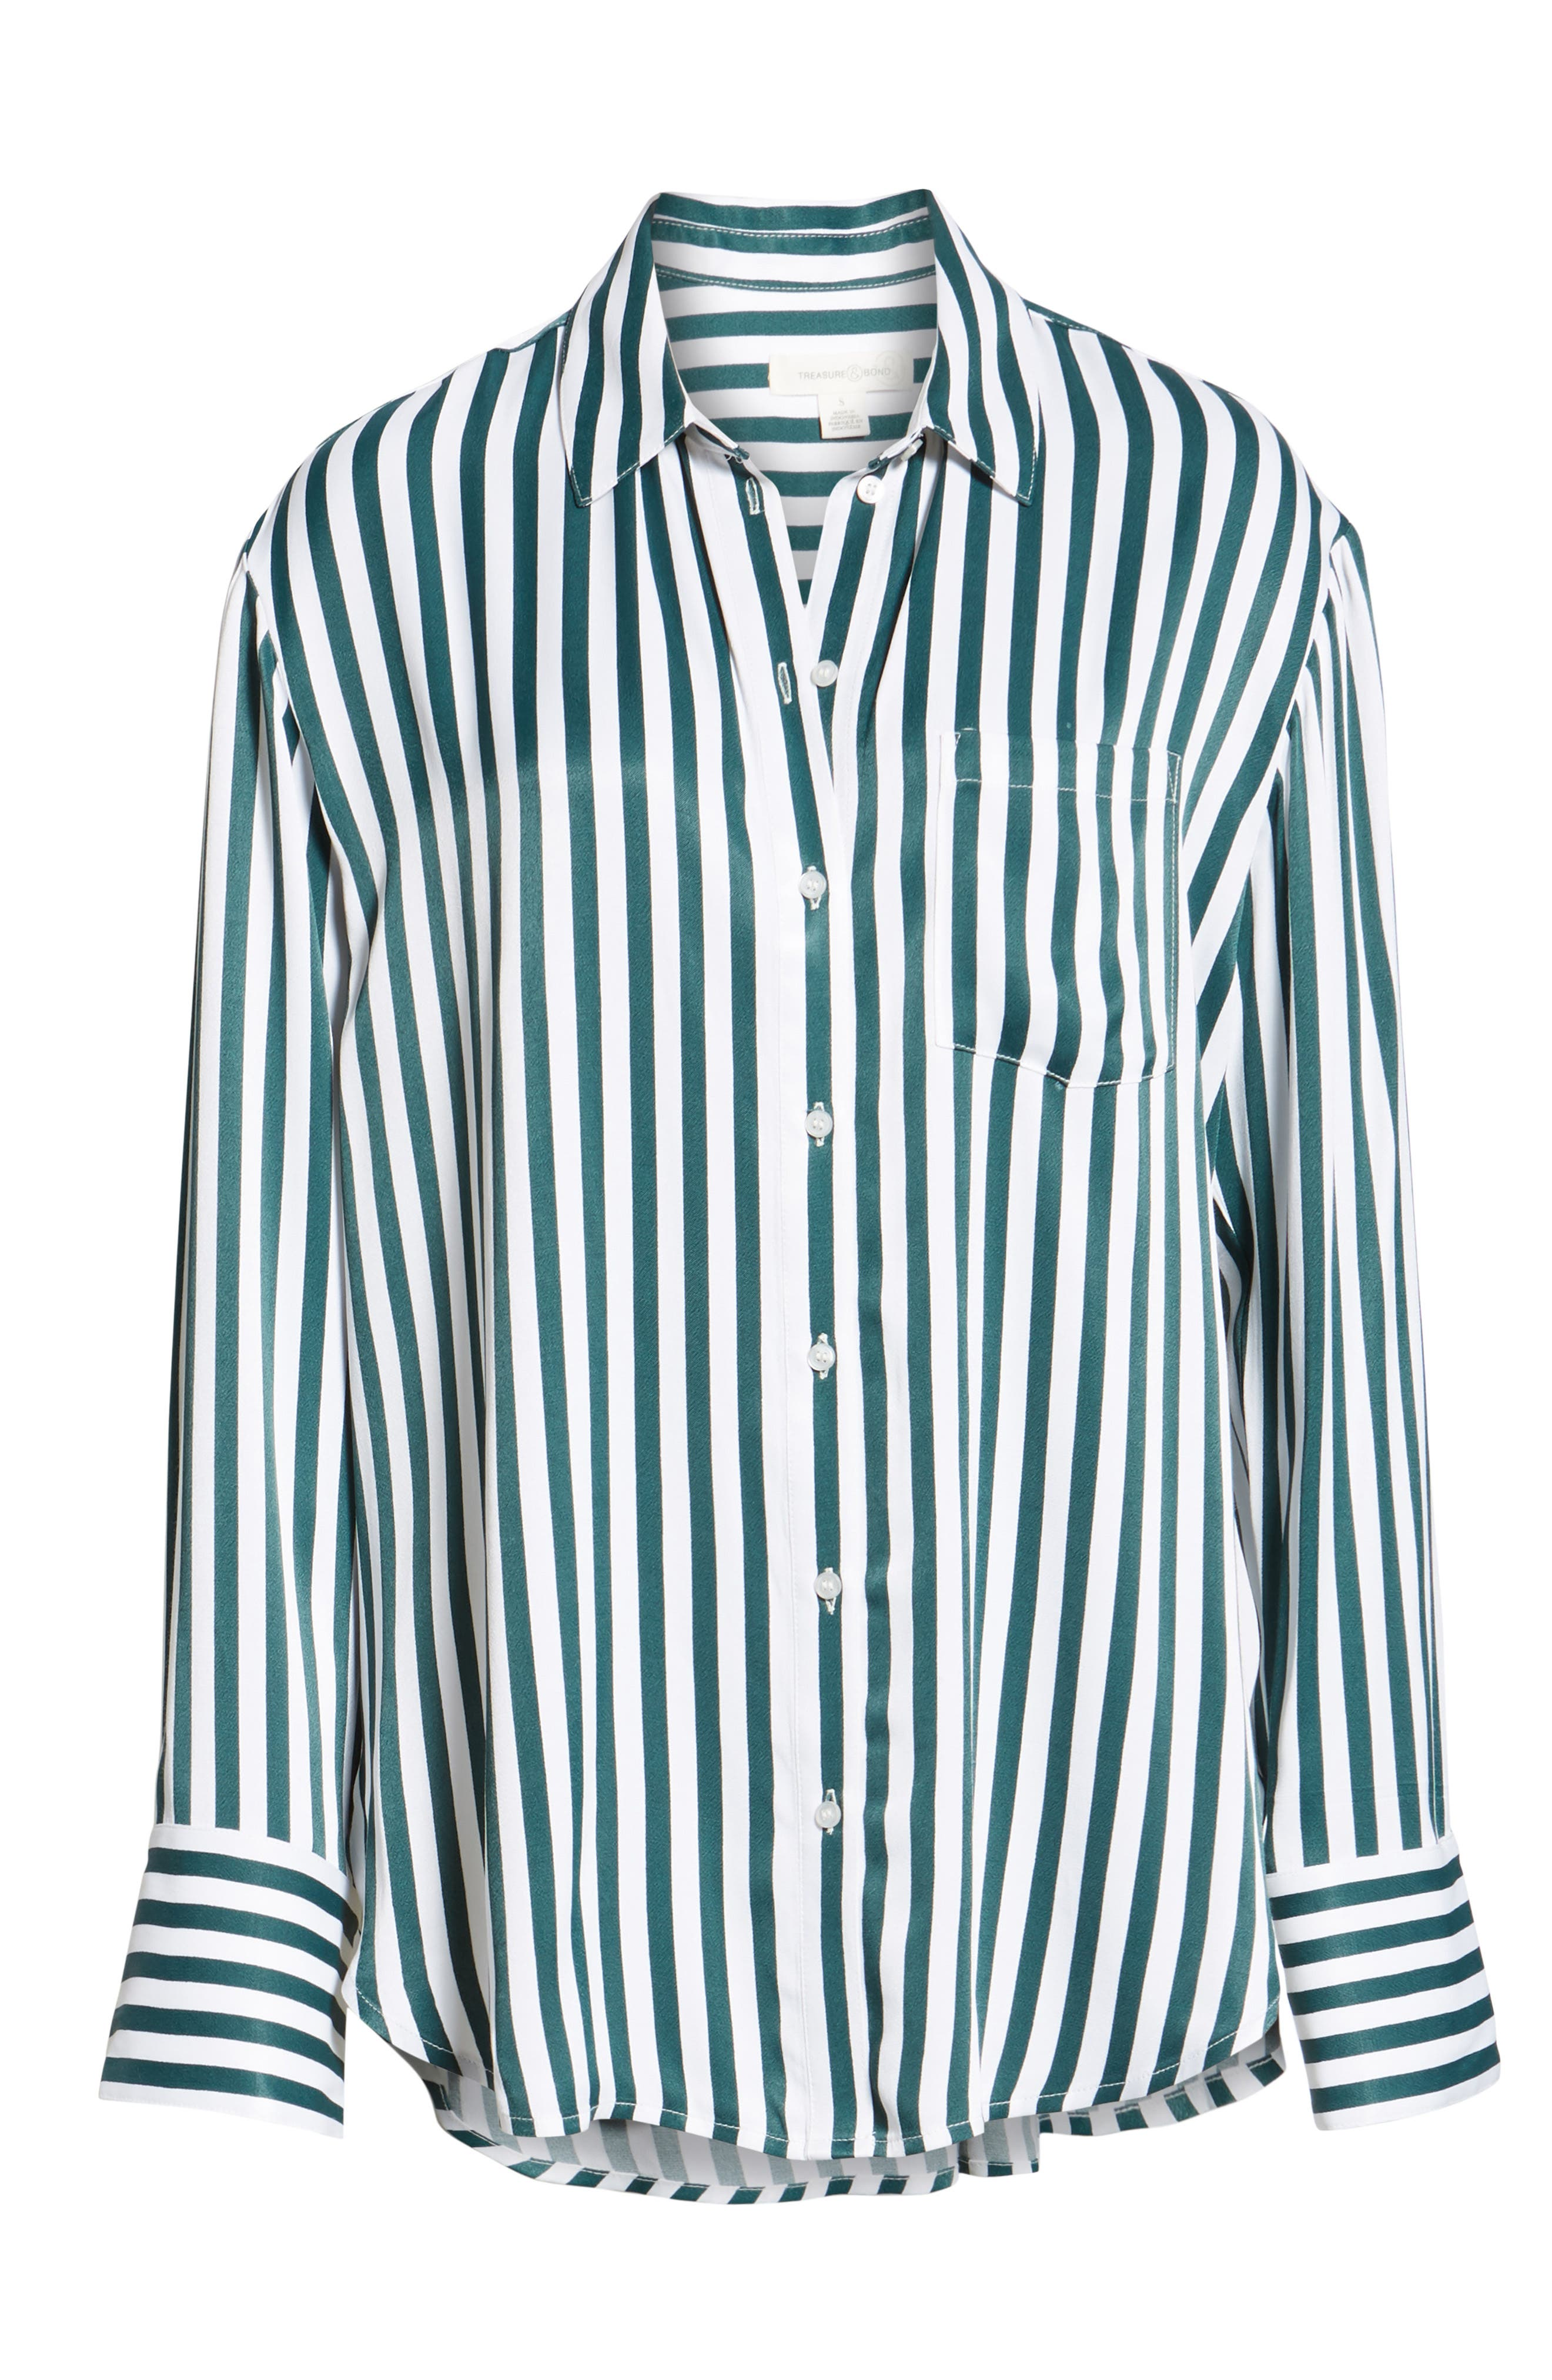 Striped Boyfriend Shirt,                             Alternate thumbnail 6, color,                             GREEN BUG WIDE STRIPE